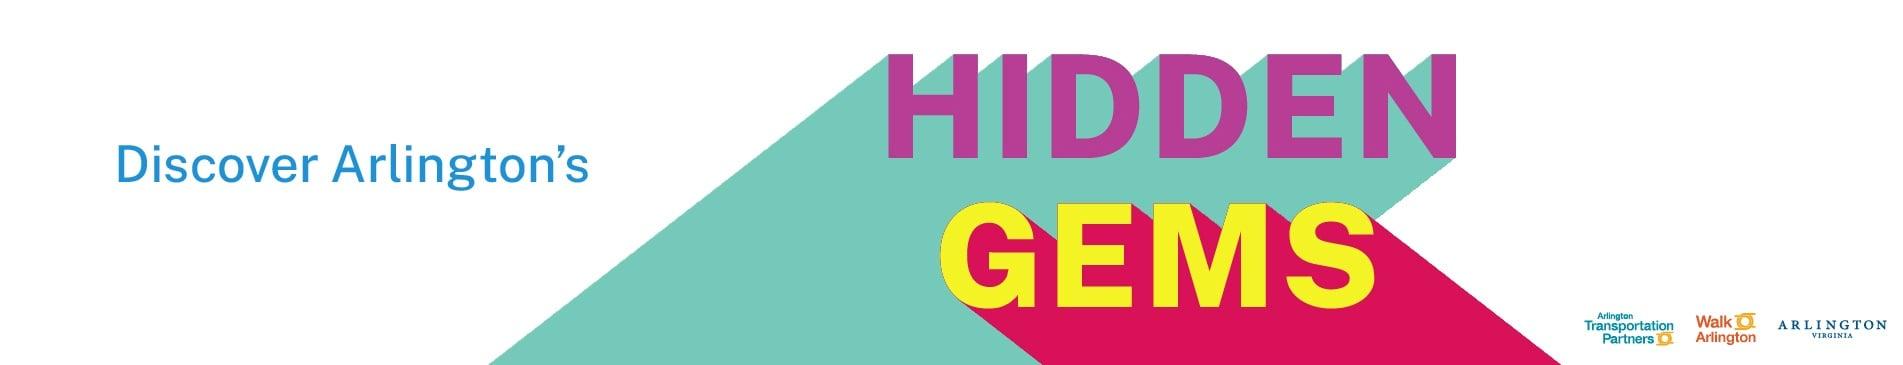 ATP Landing Page Hidden Gems Homepage Hero_Post Event